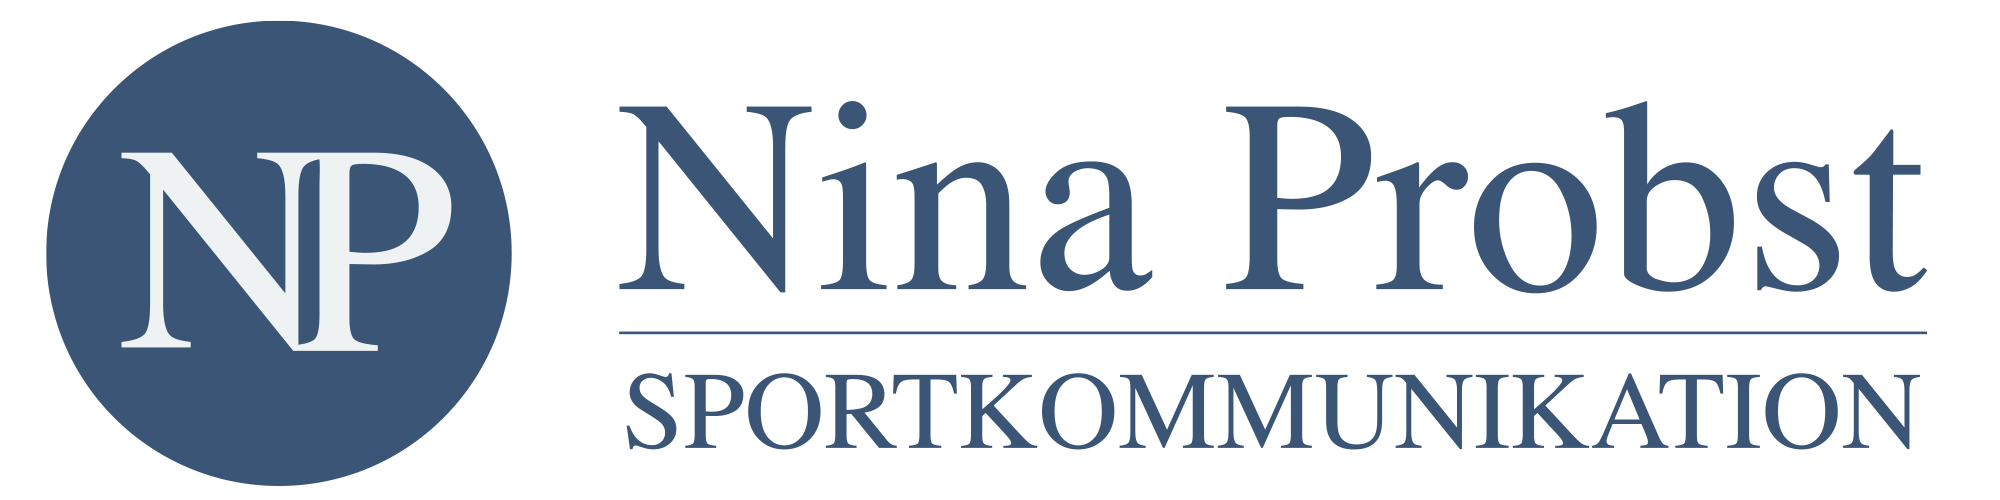 Nina Probst – Sportkommunikation